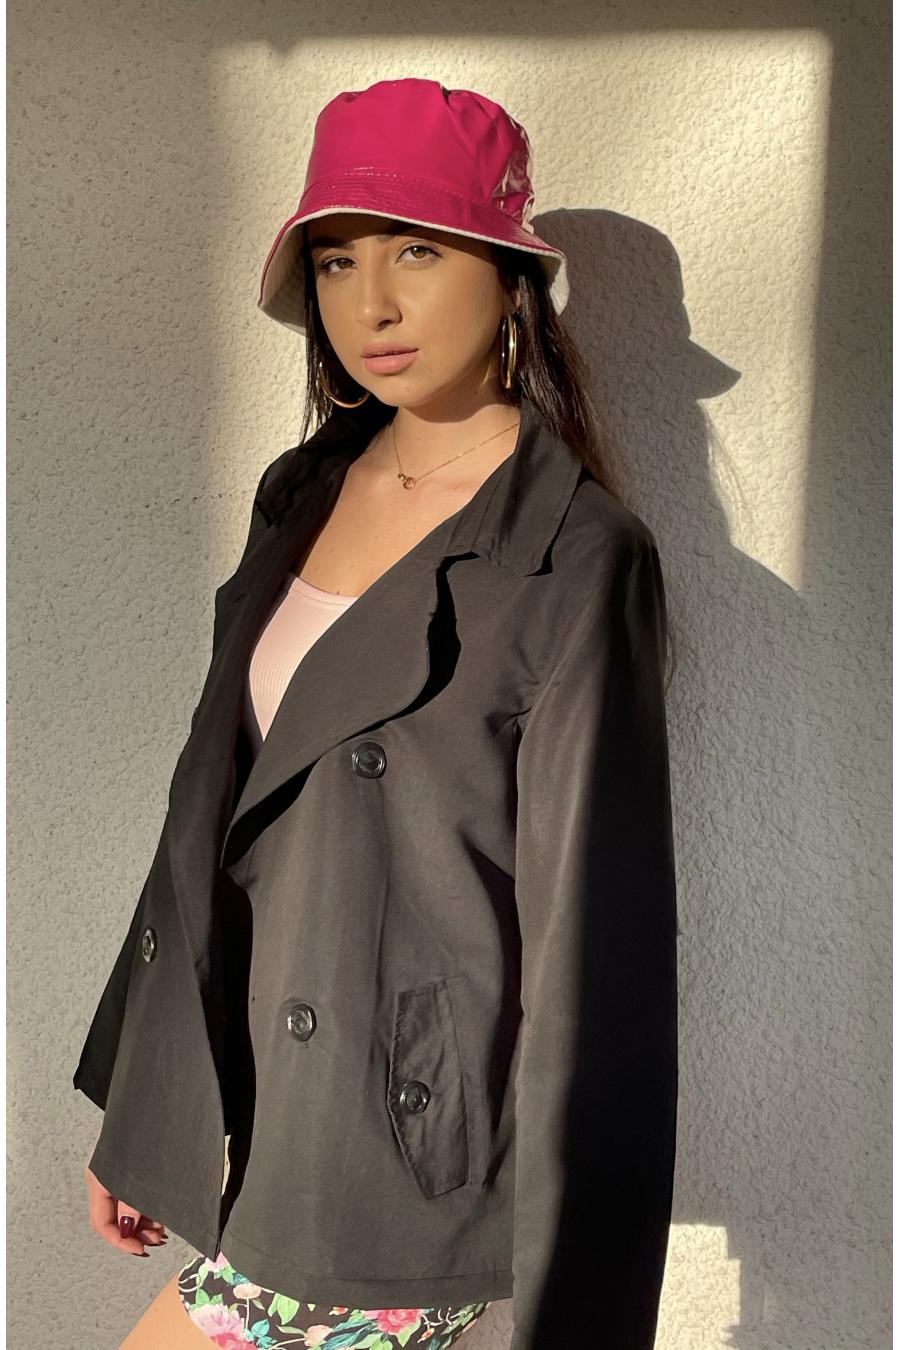 Schitterende kleine zwarte overjas, modeklassiekers. Mode dressoir